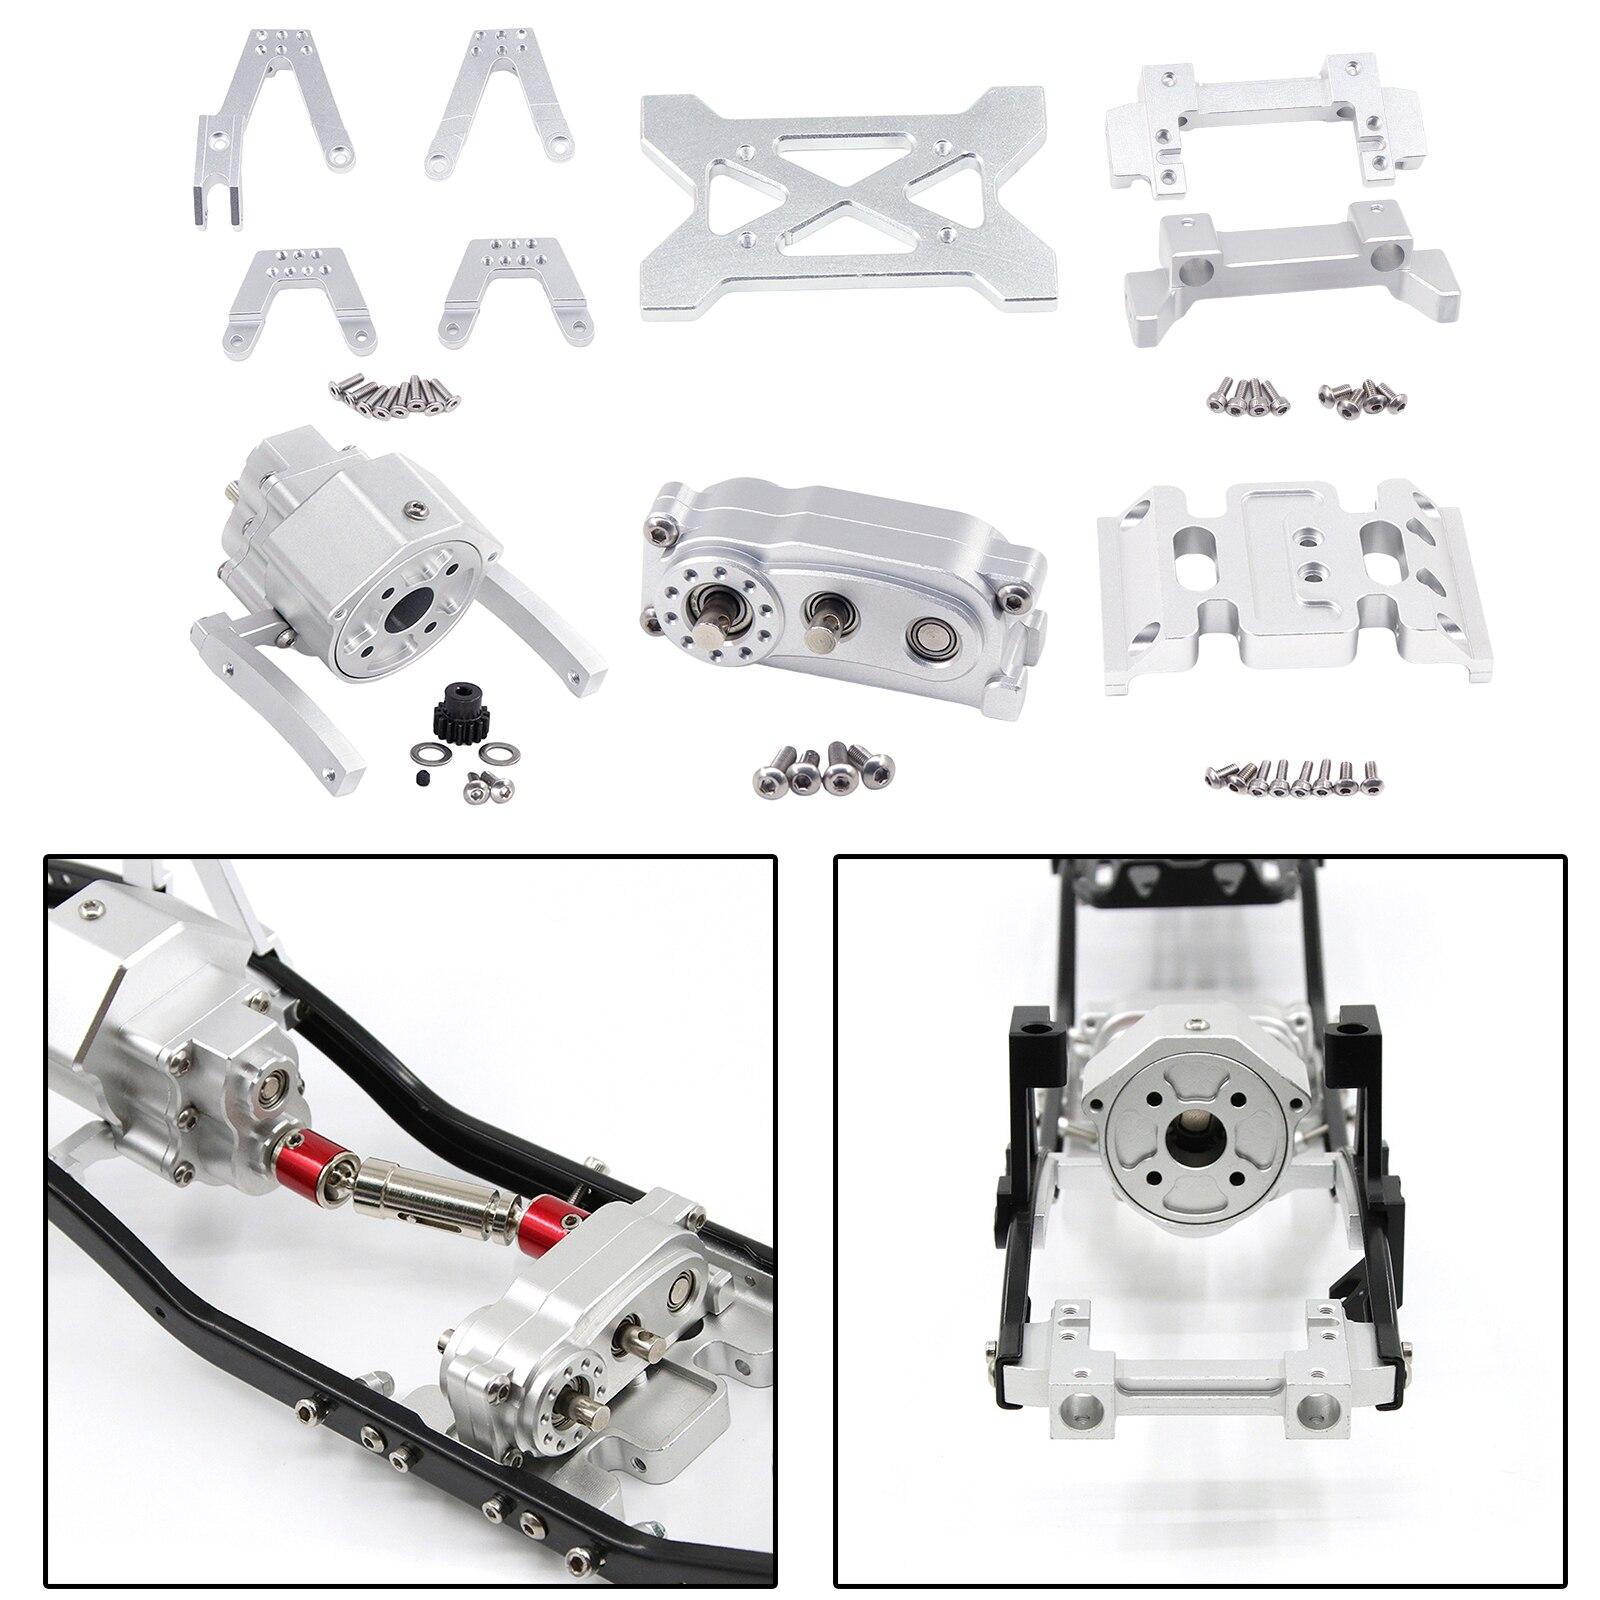 RC Spare Metal Prefixal /Transfer Case/Shock Mount for Axial SCX10 SCX10 II 90046 Car Trcuk Buggy DIY Parts